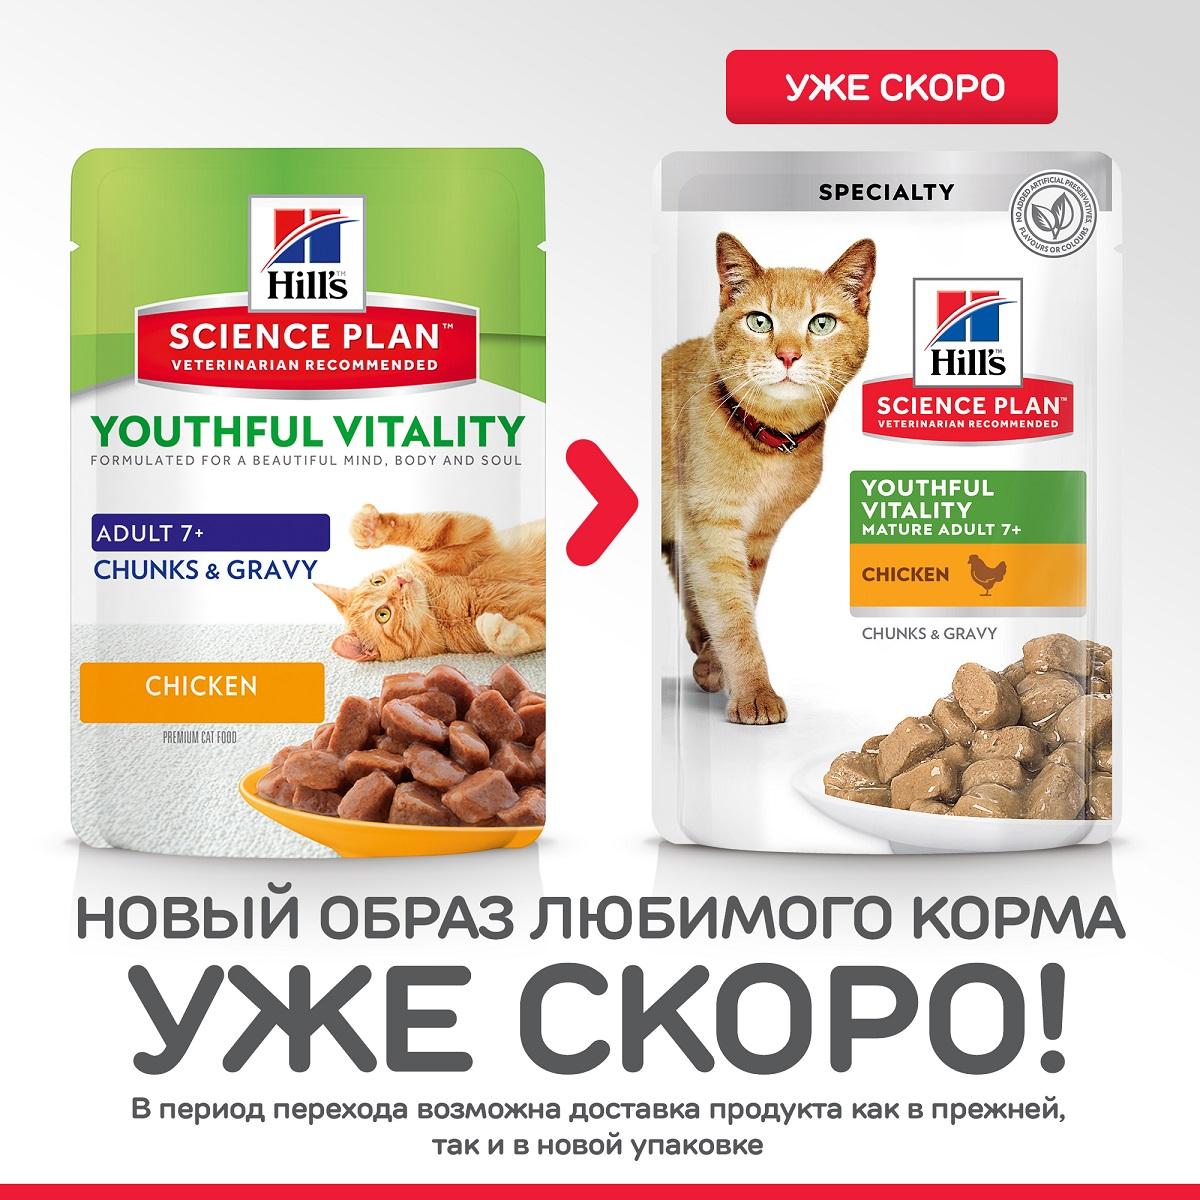 Hill's Science Plan Youthful Vitality Курица 85 гр 60868